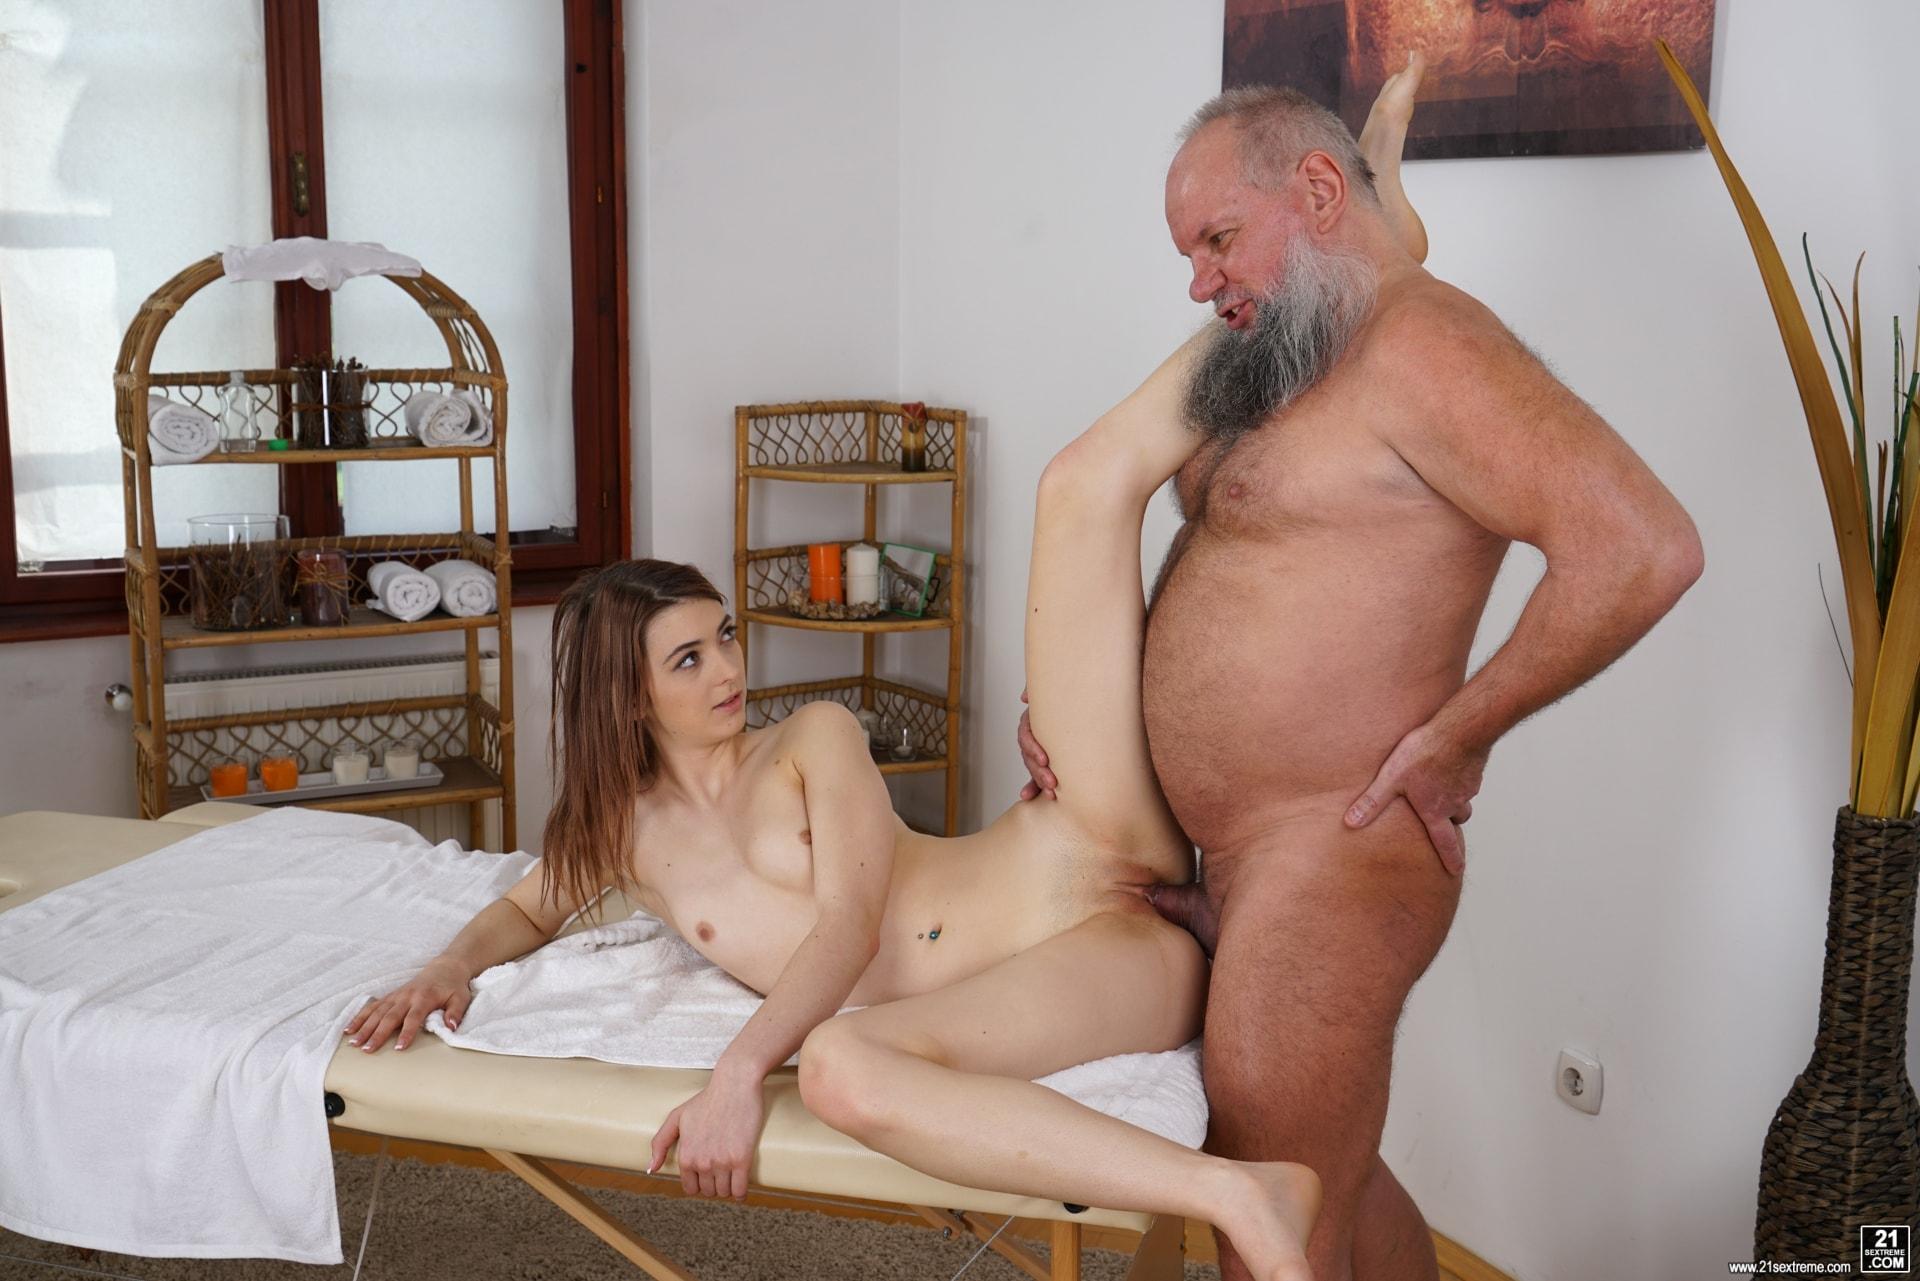 21Sextury 'Let Grandpa Massage You' starring Tera Link (Photo 187)